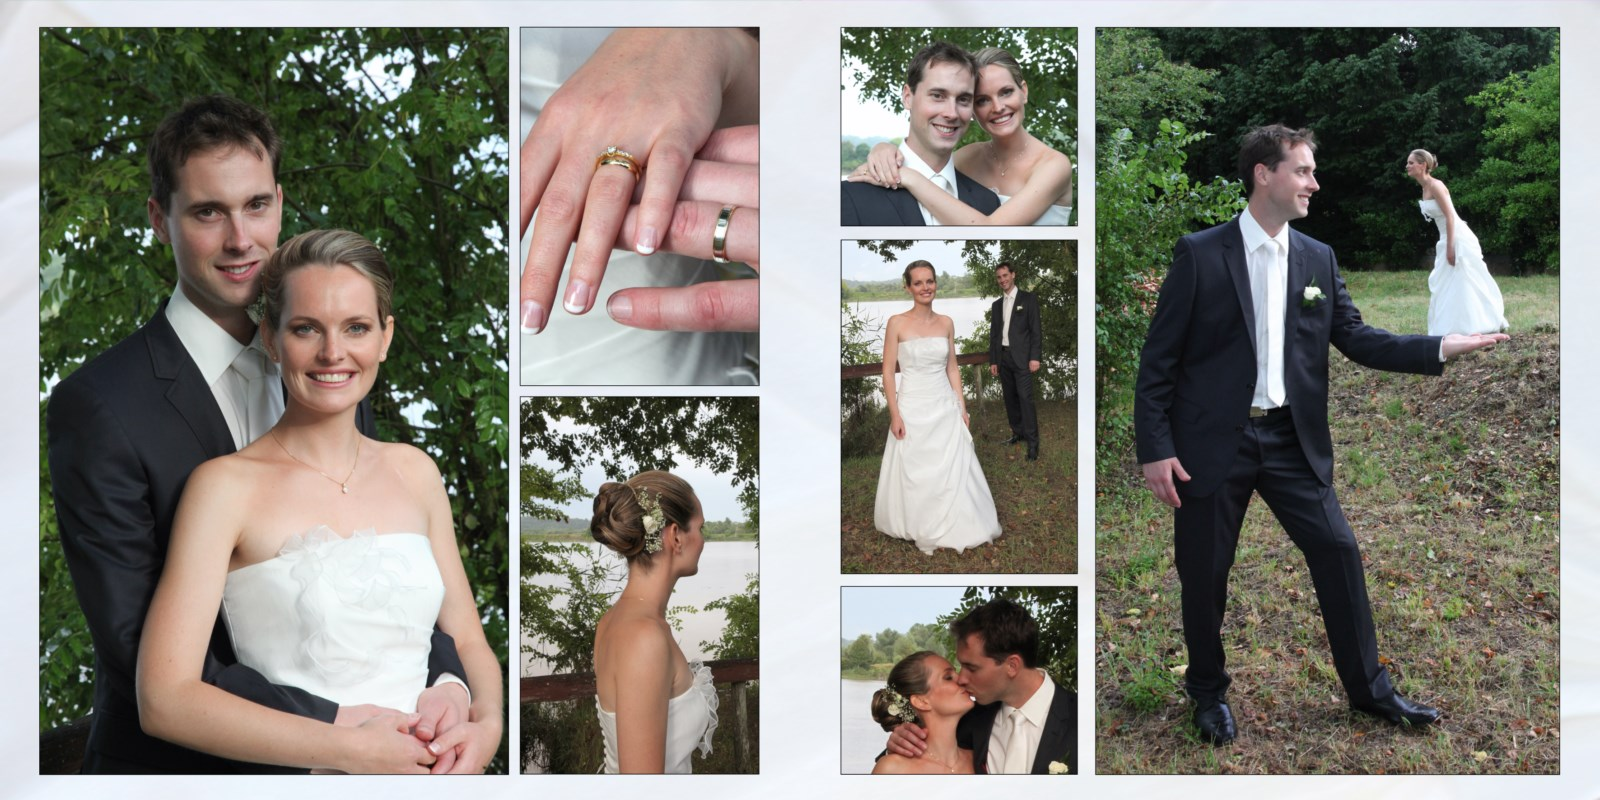 Livre photo mariage 01.jpg